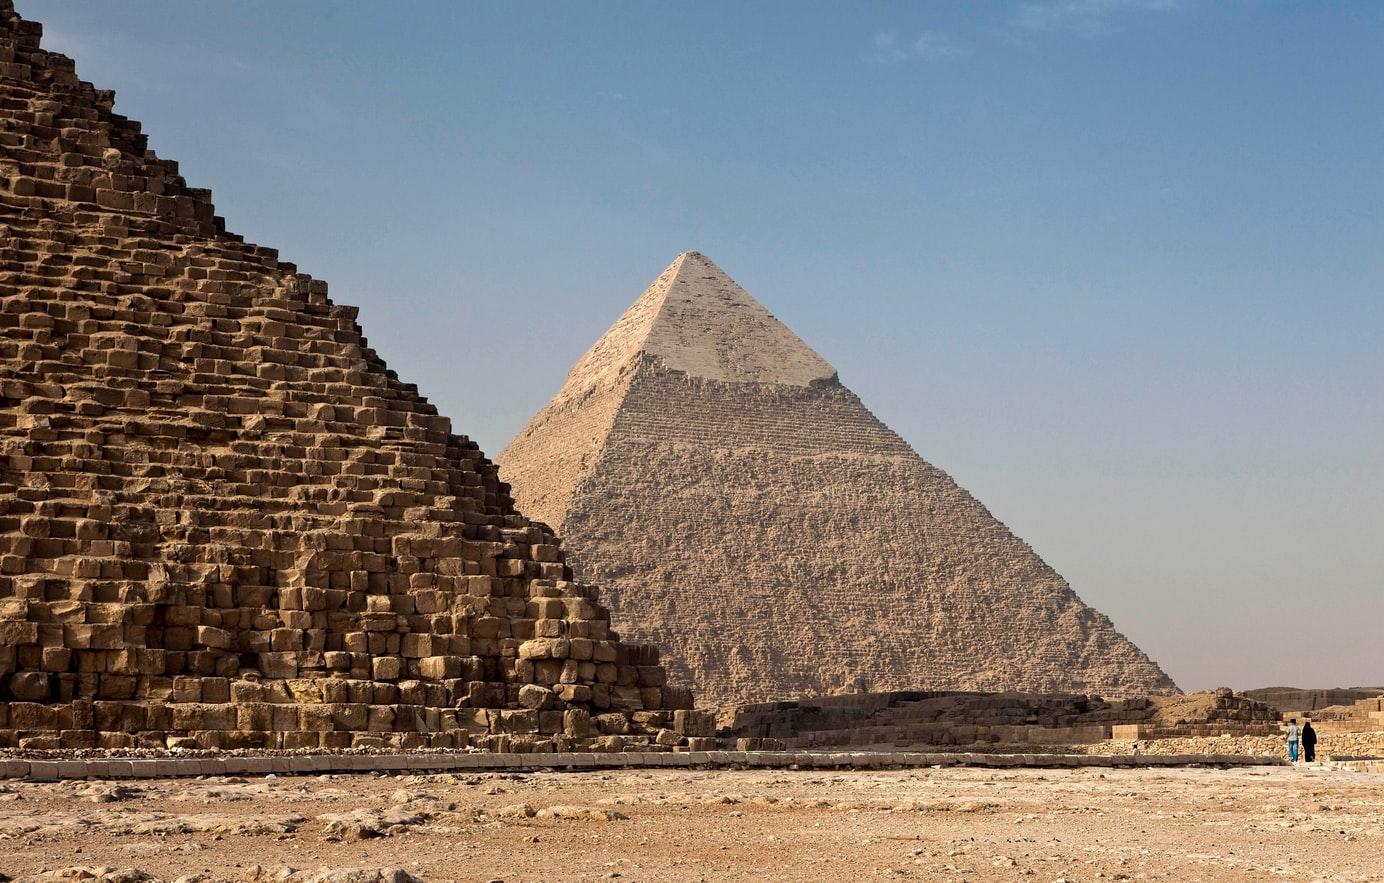 C:\Users\Shrutika Yadav\Desktop\pyramids-of-giza.jpg